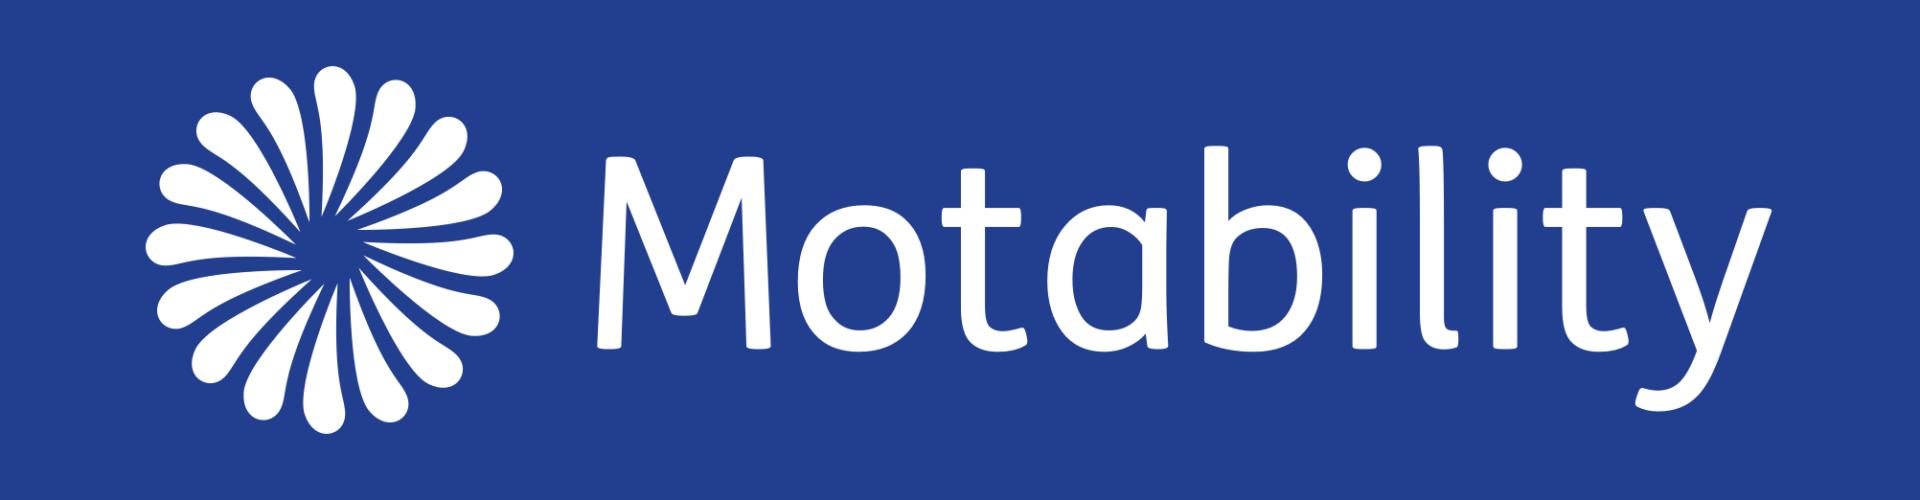 Motability_Master_Logotype_rgb@4x